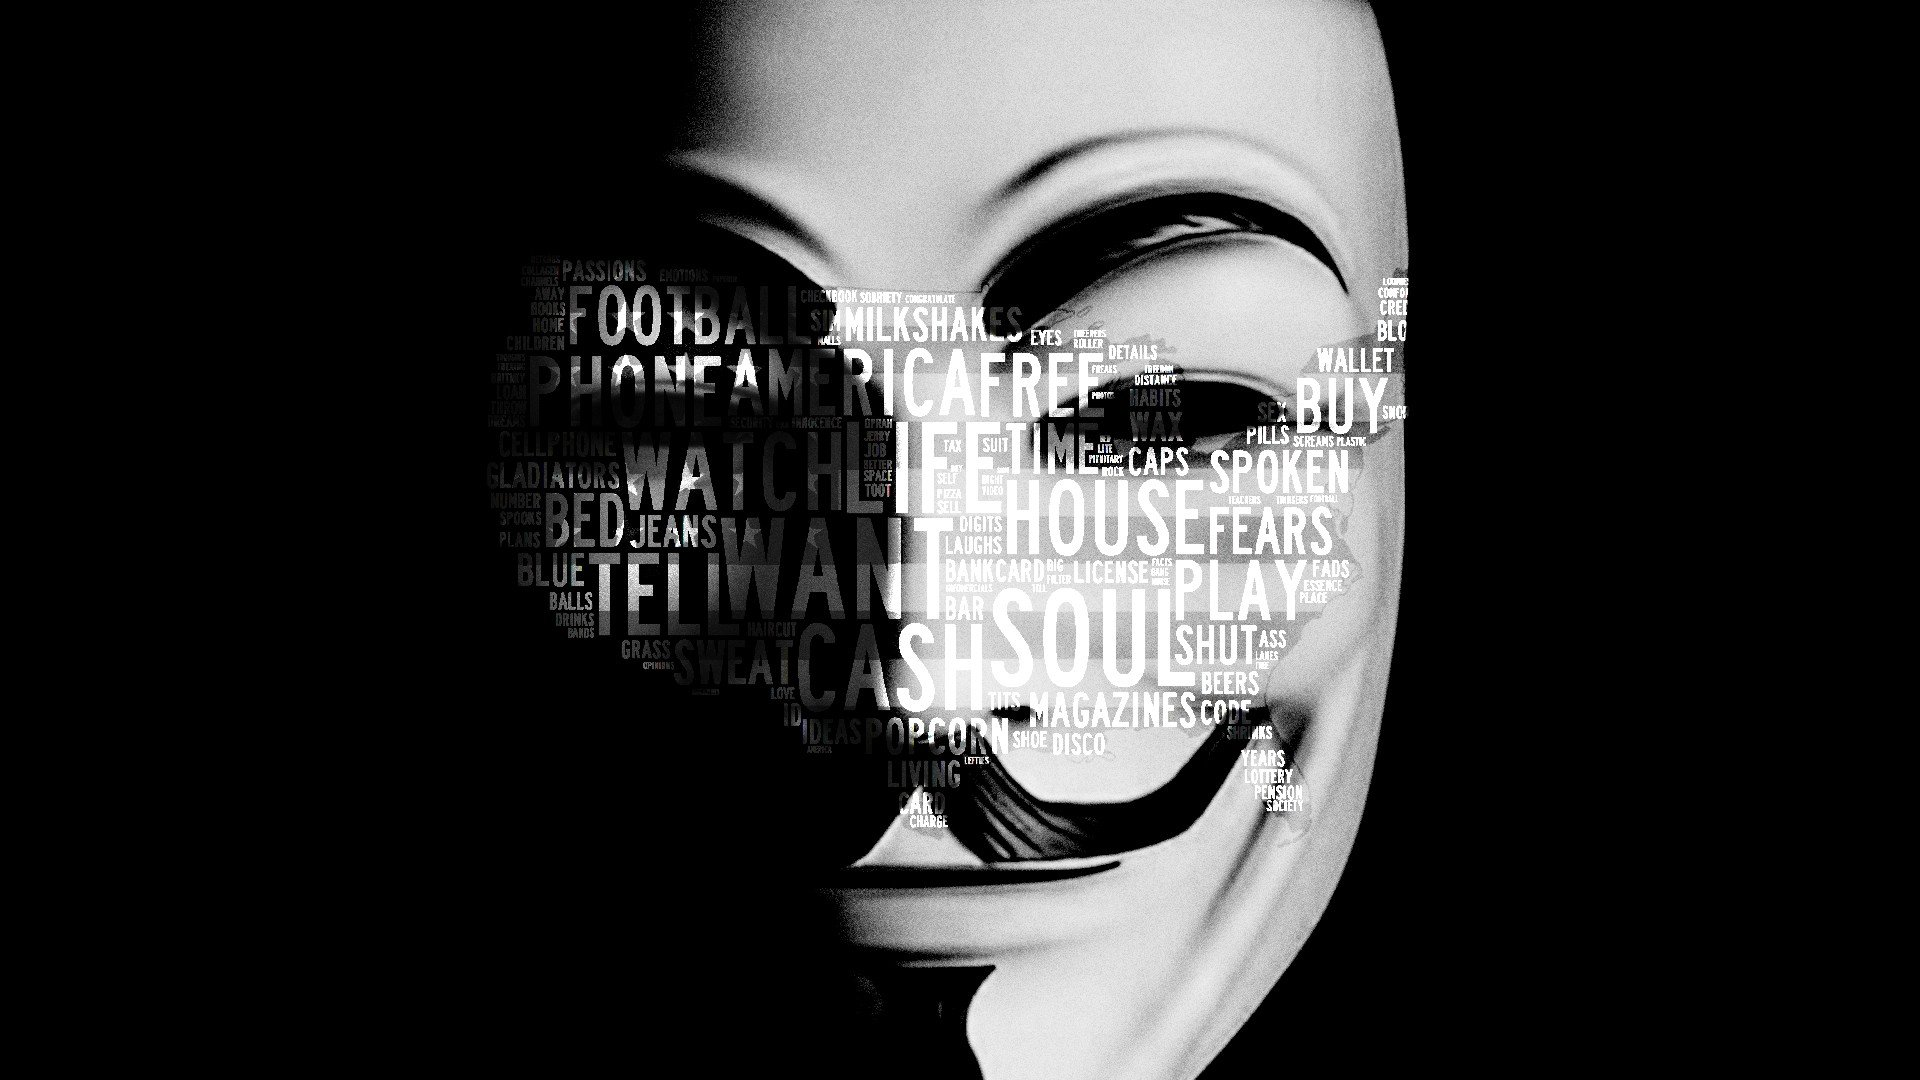 Jason Voorhees Mask Wallpaper Iphone Anonymous Mask Wallpapers Hd Pixelstalk Net